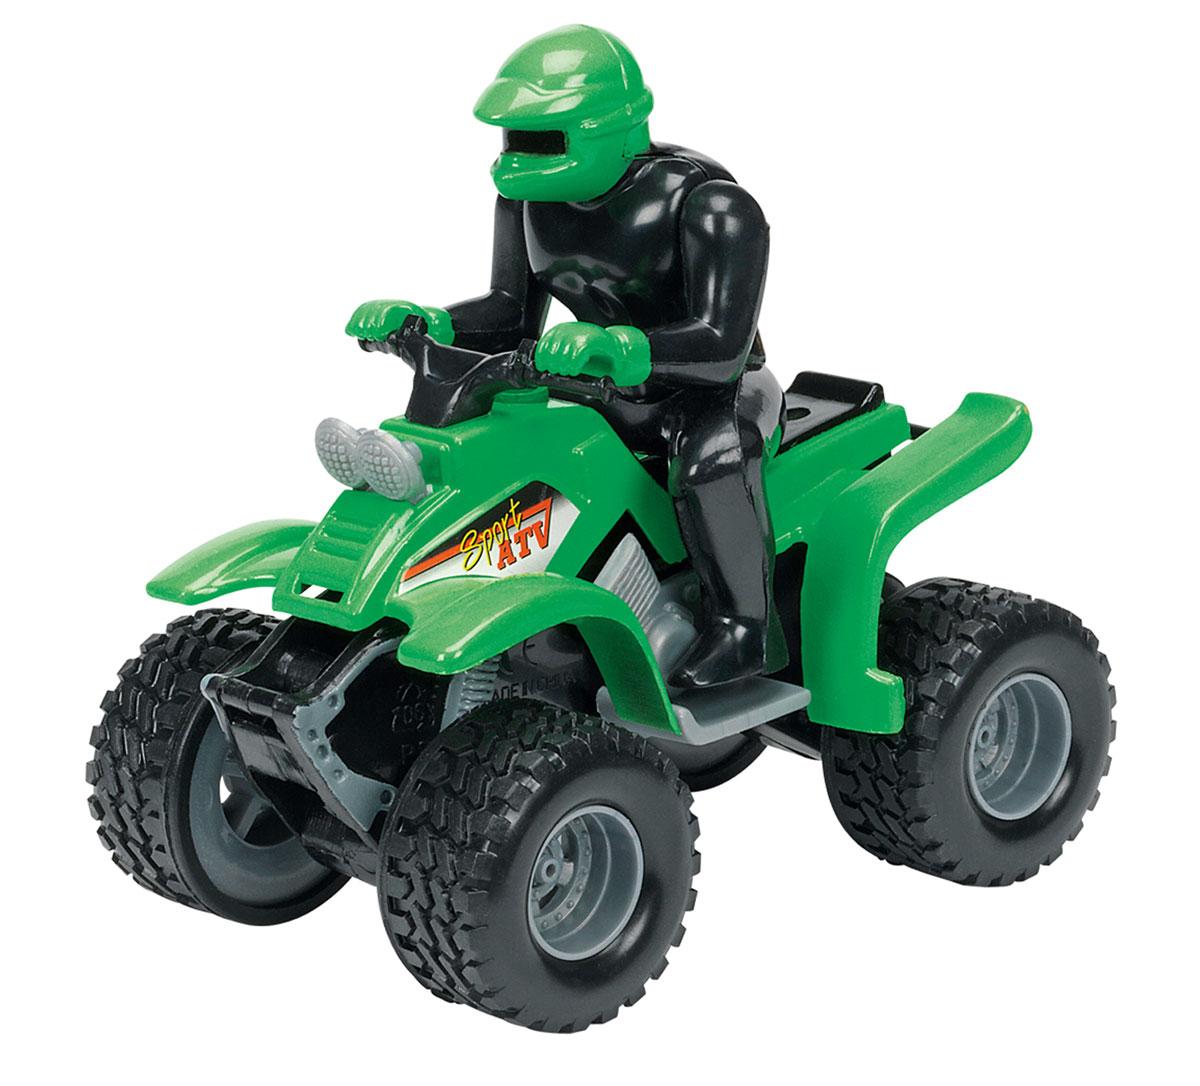 Dickie Toys Квадроцикл инерционный цвет зеленый машины tolo toys сафари квадроцикл